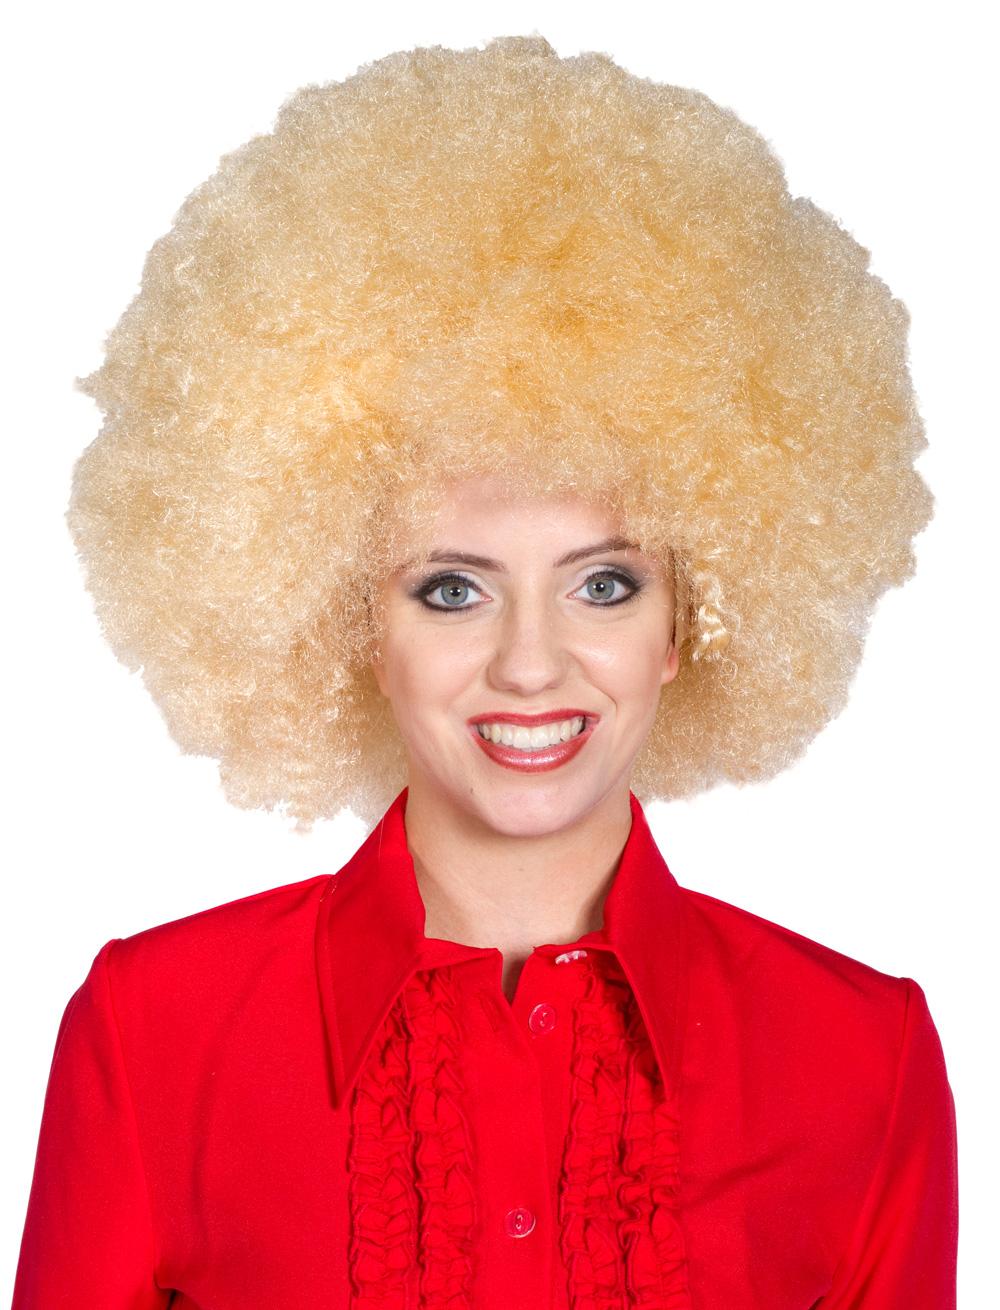 Kostuemzubehor Peruecke Afro blond